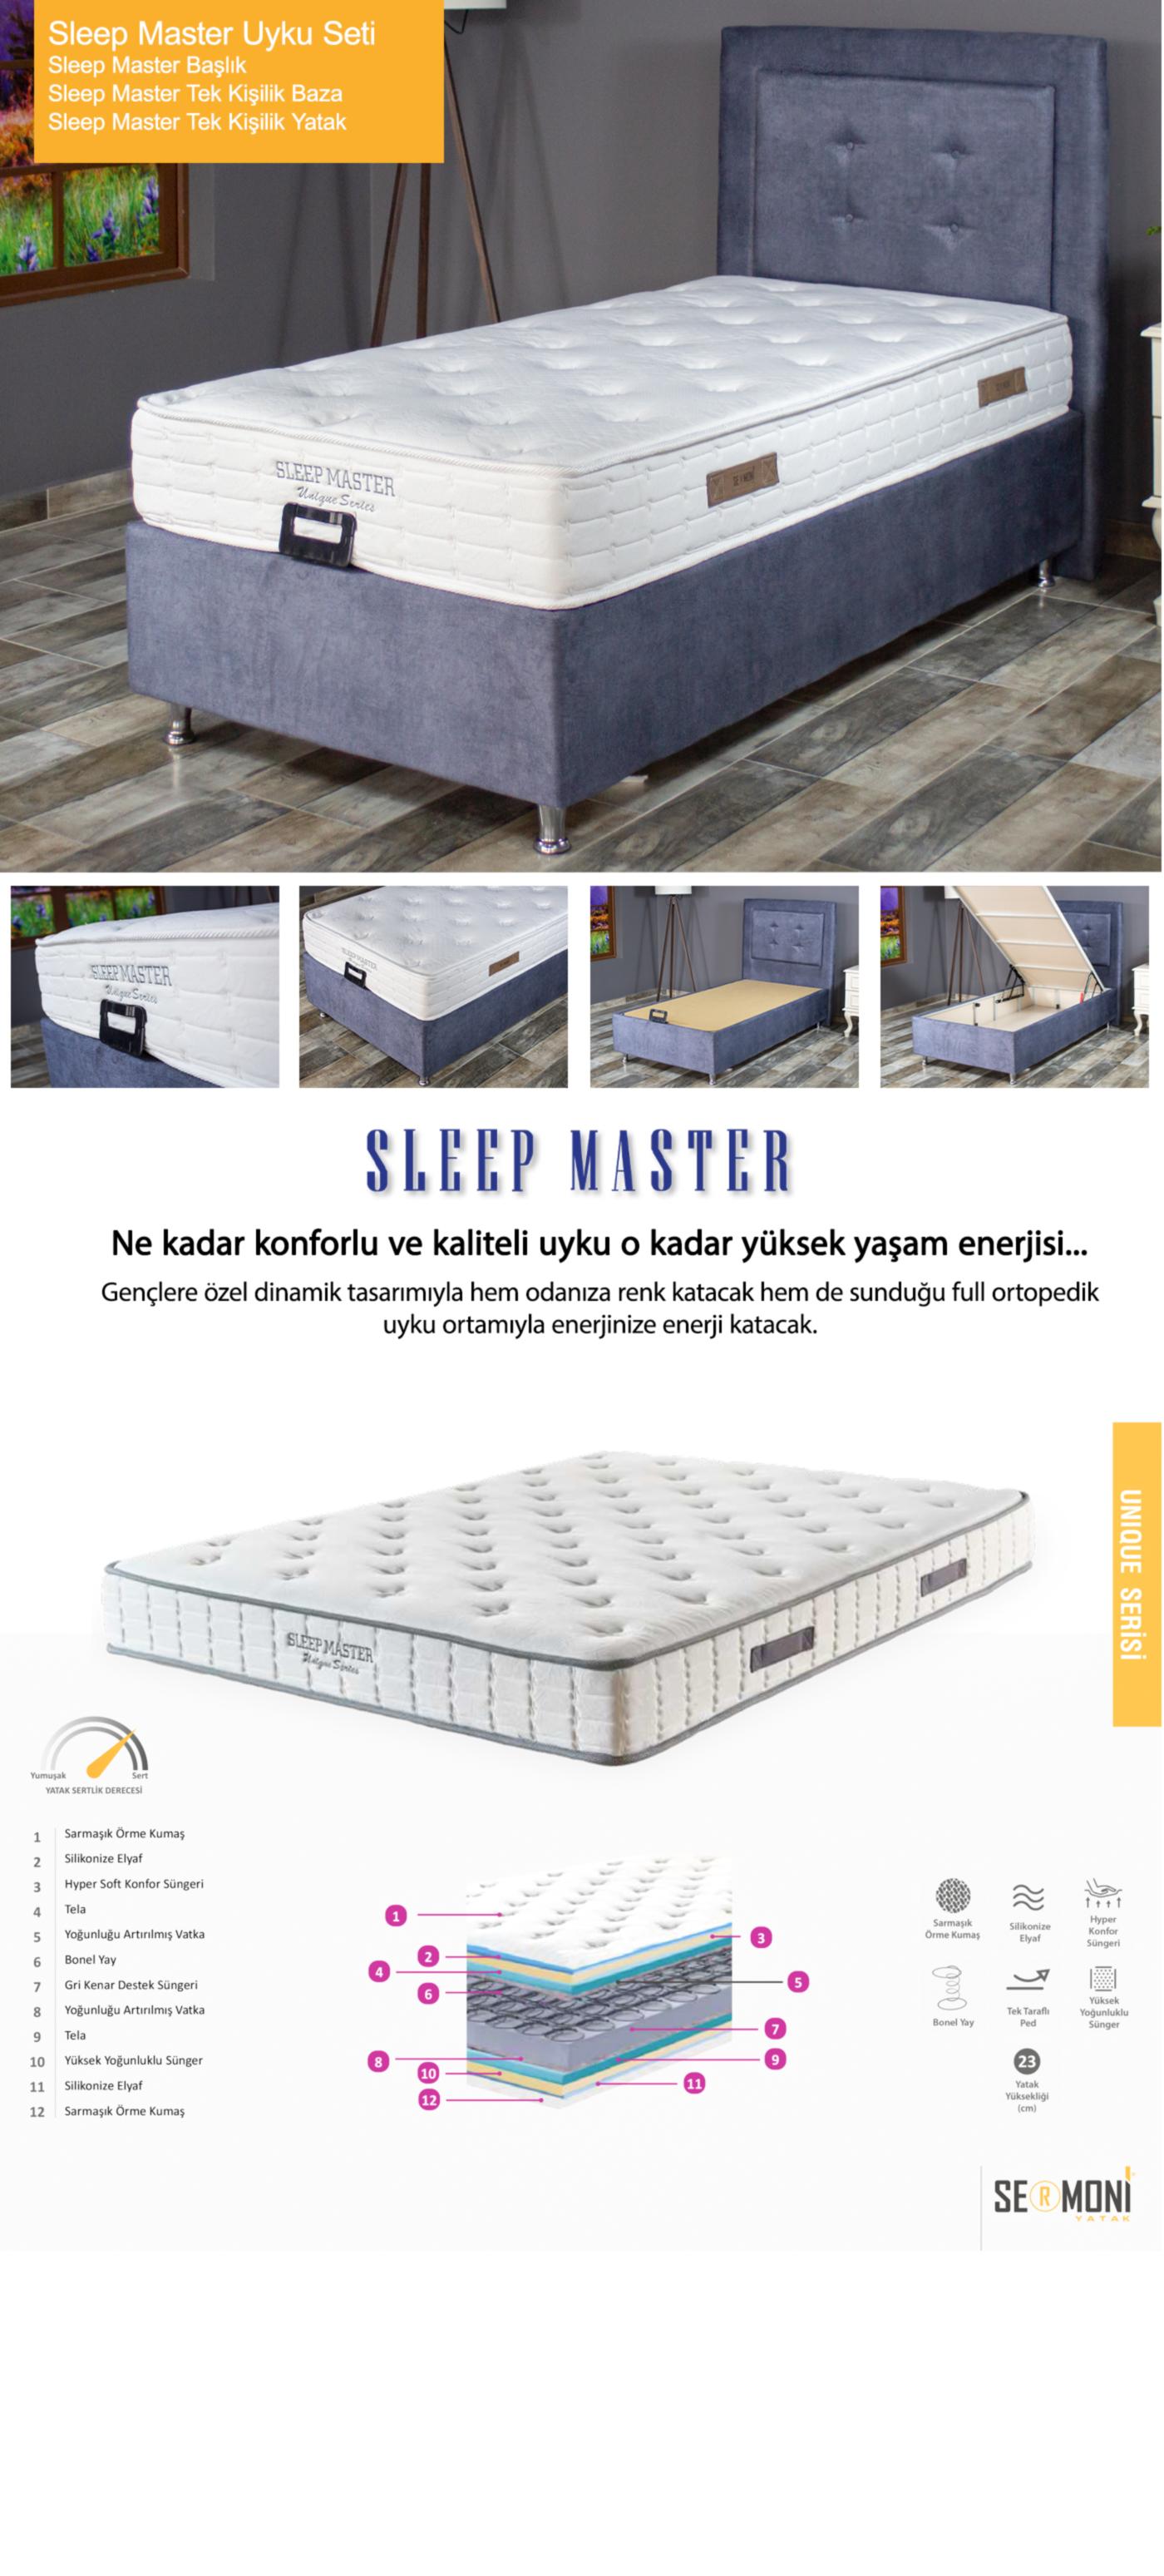 Sleep Master Uyku Seti